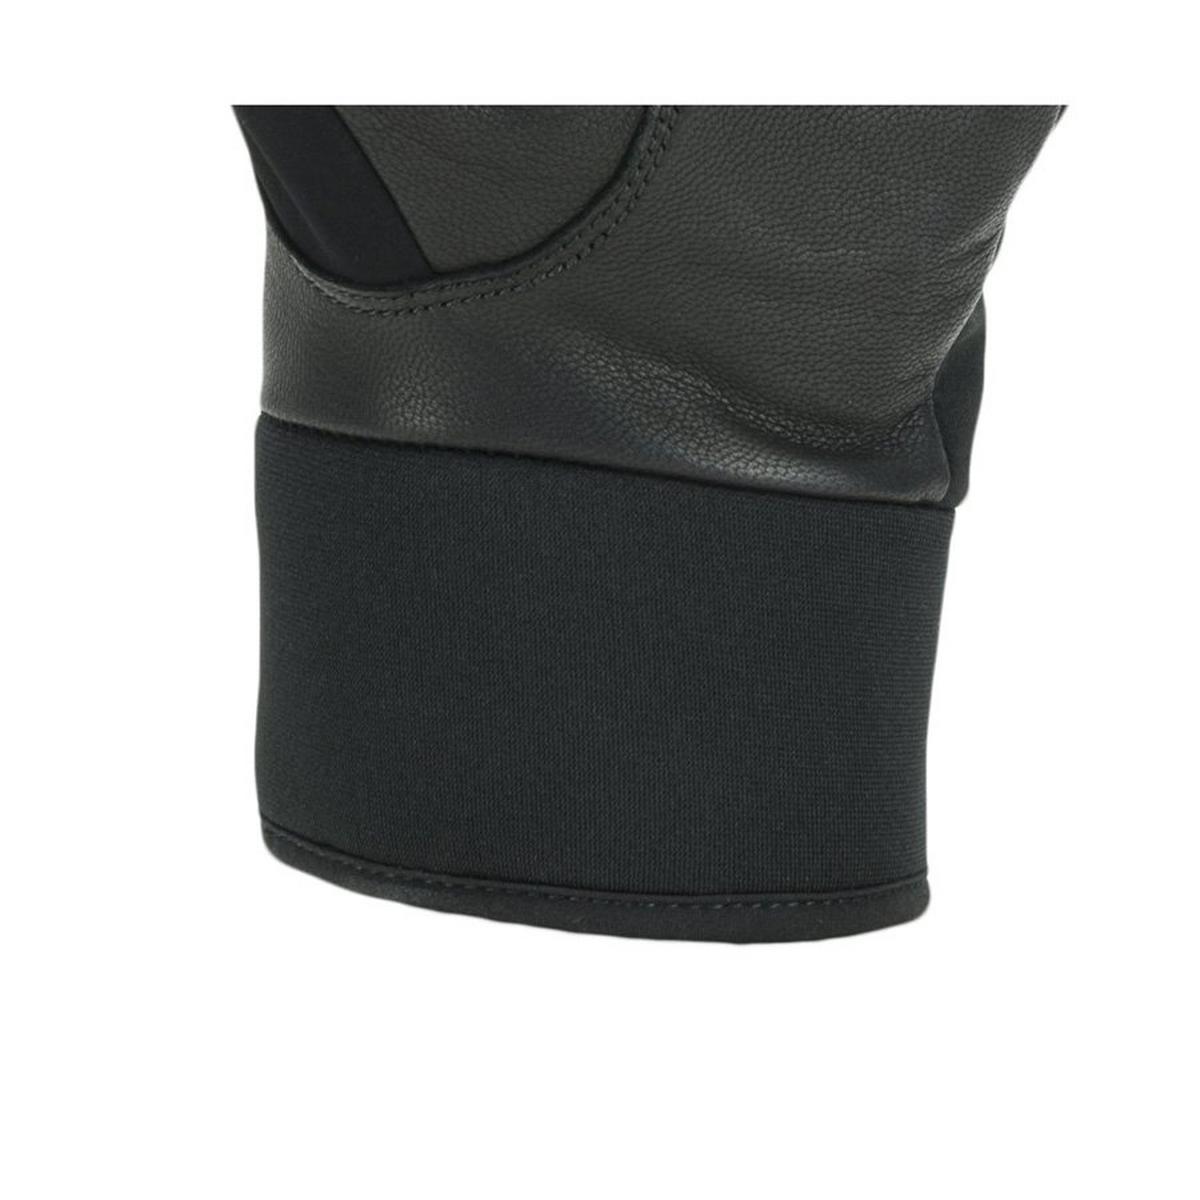 Sealskinz Men's Sealskinz Waterproof All Weather Insulated Glove - Black